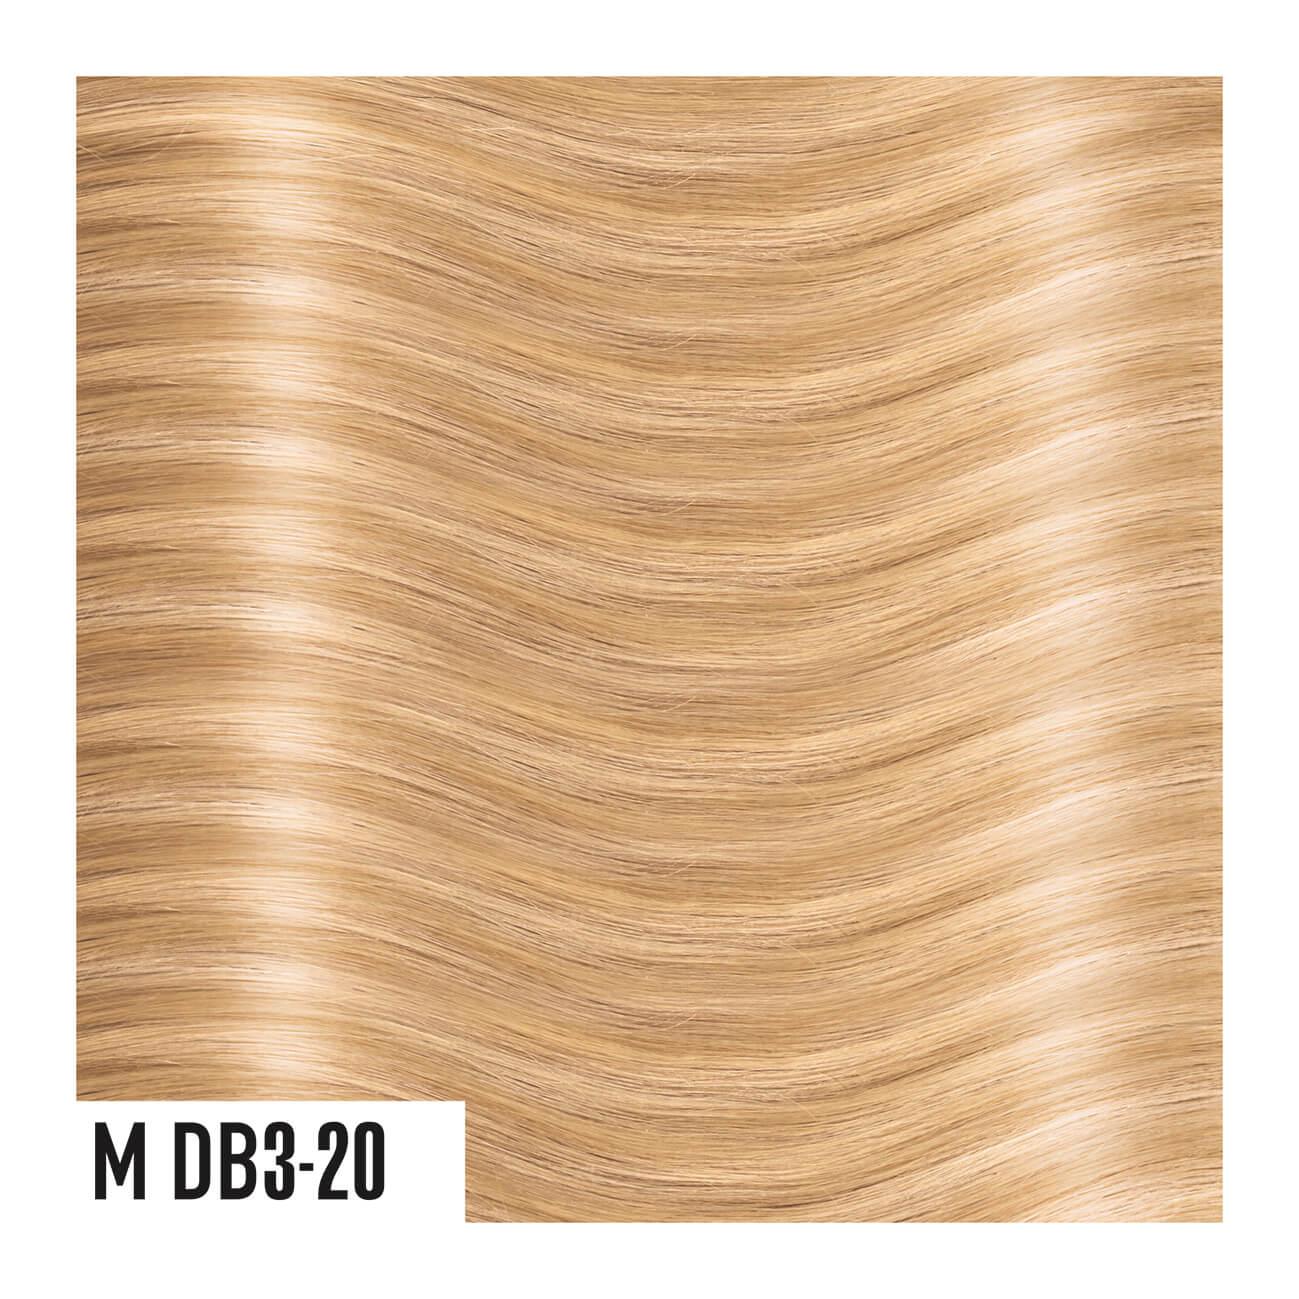 MDB3-20